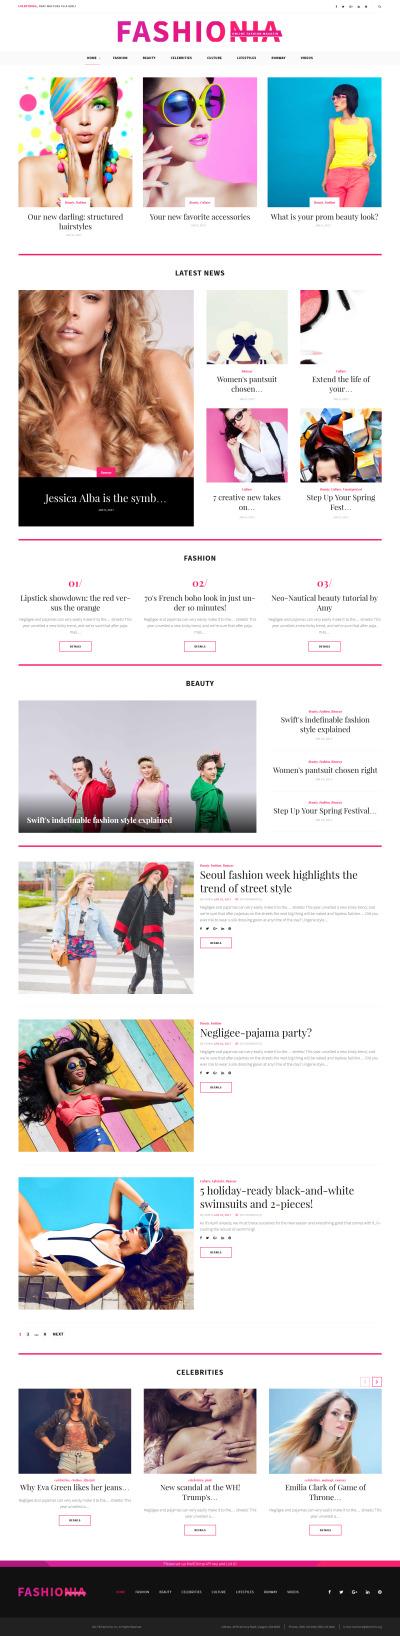 Fashionia - Online Fashion Magazine Responsive WPML ready Plantilla de WordPress #59028